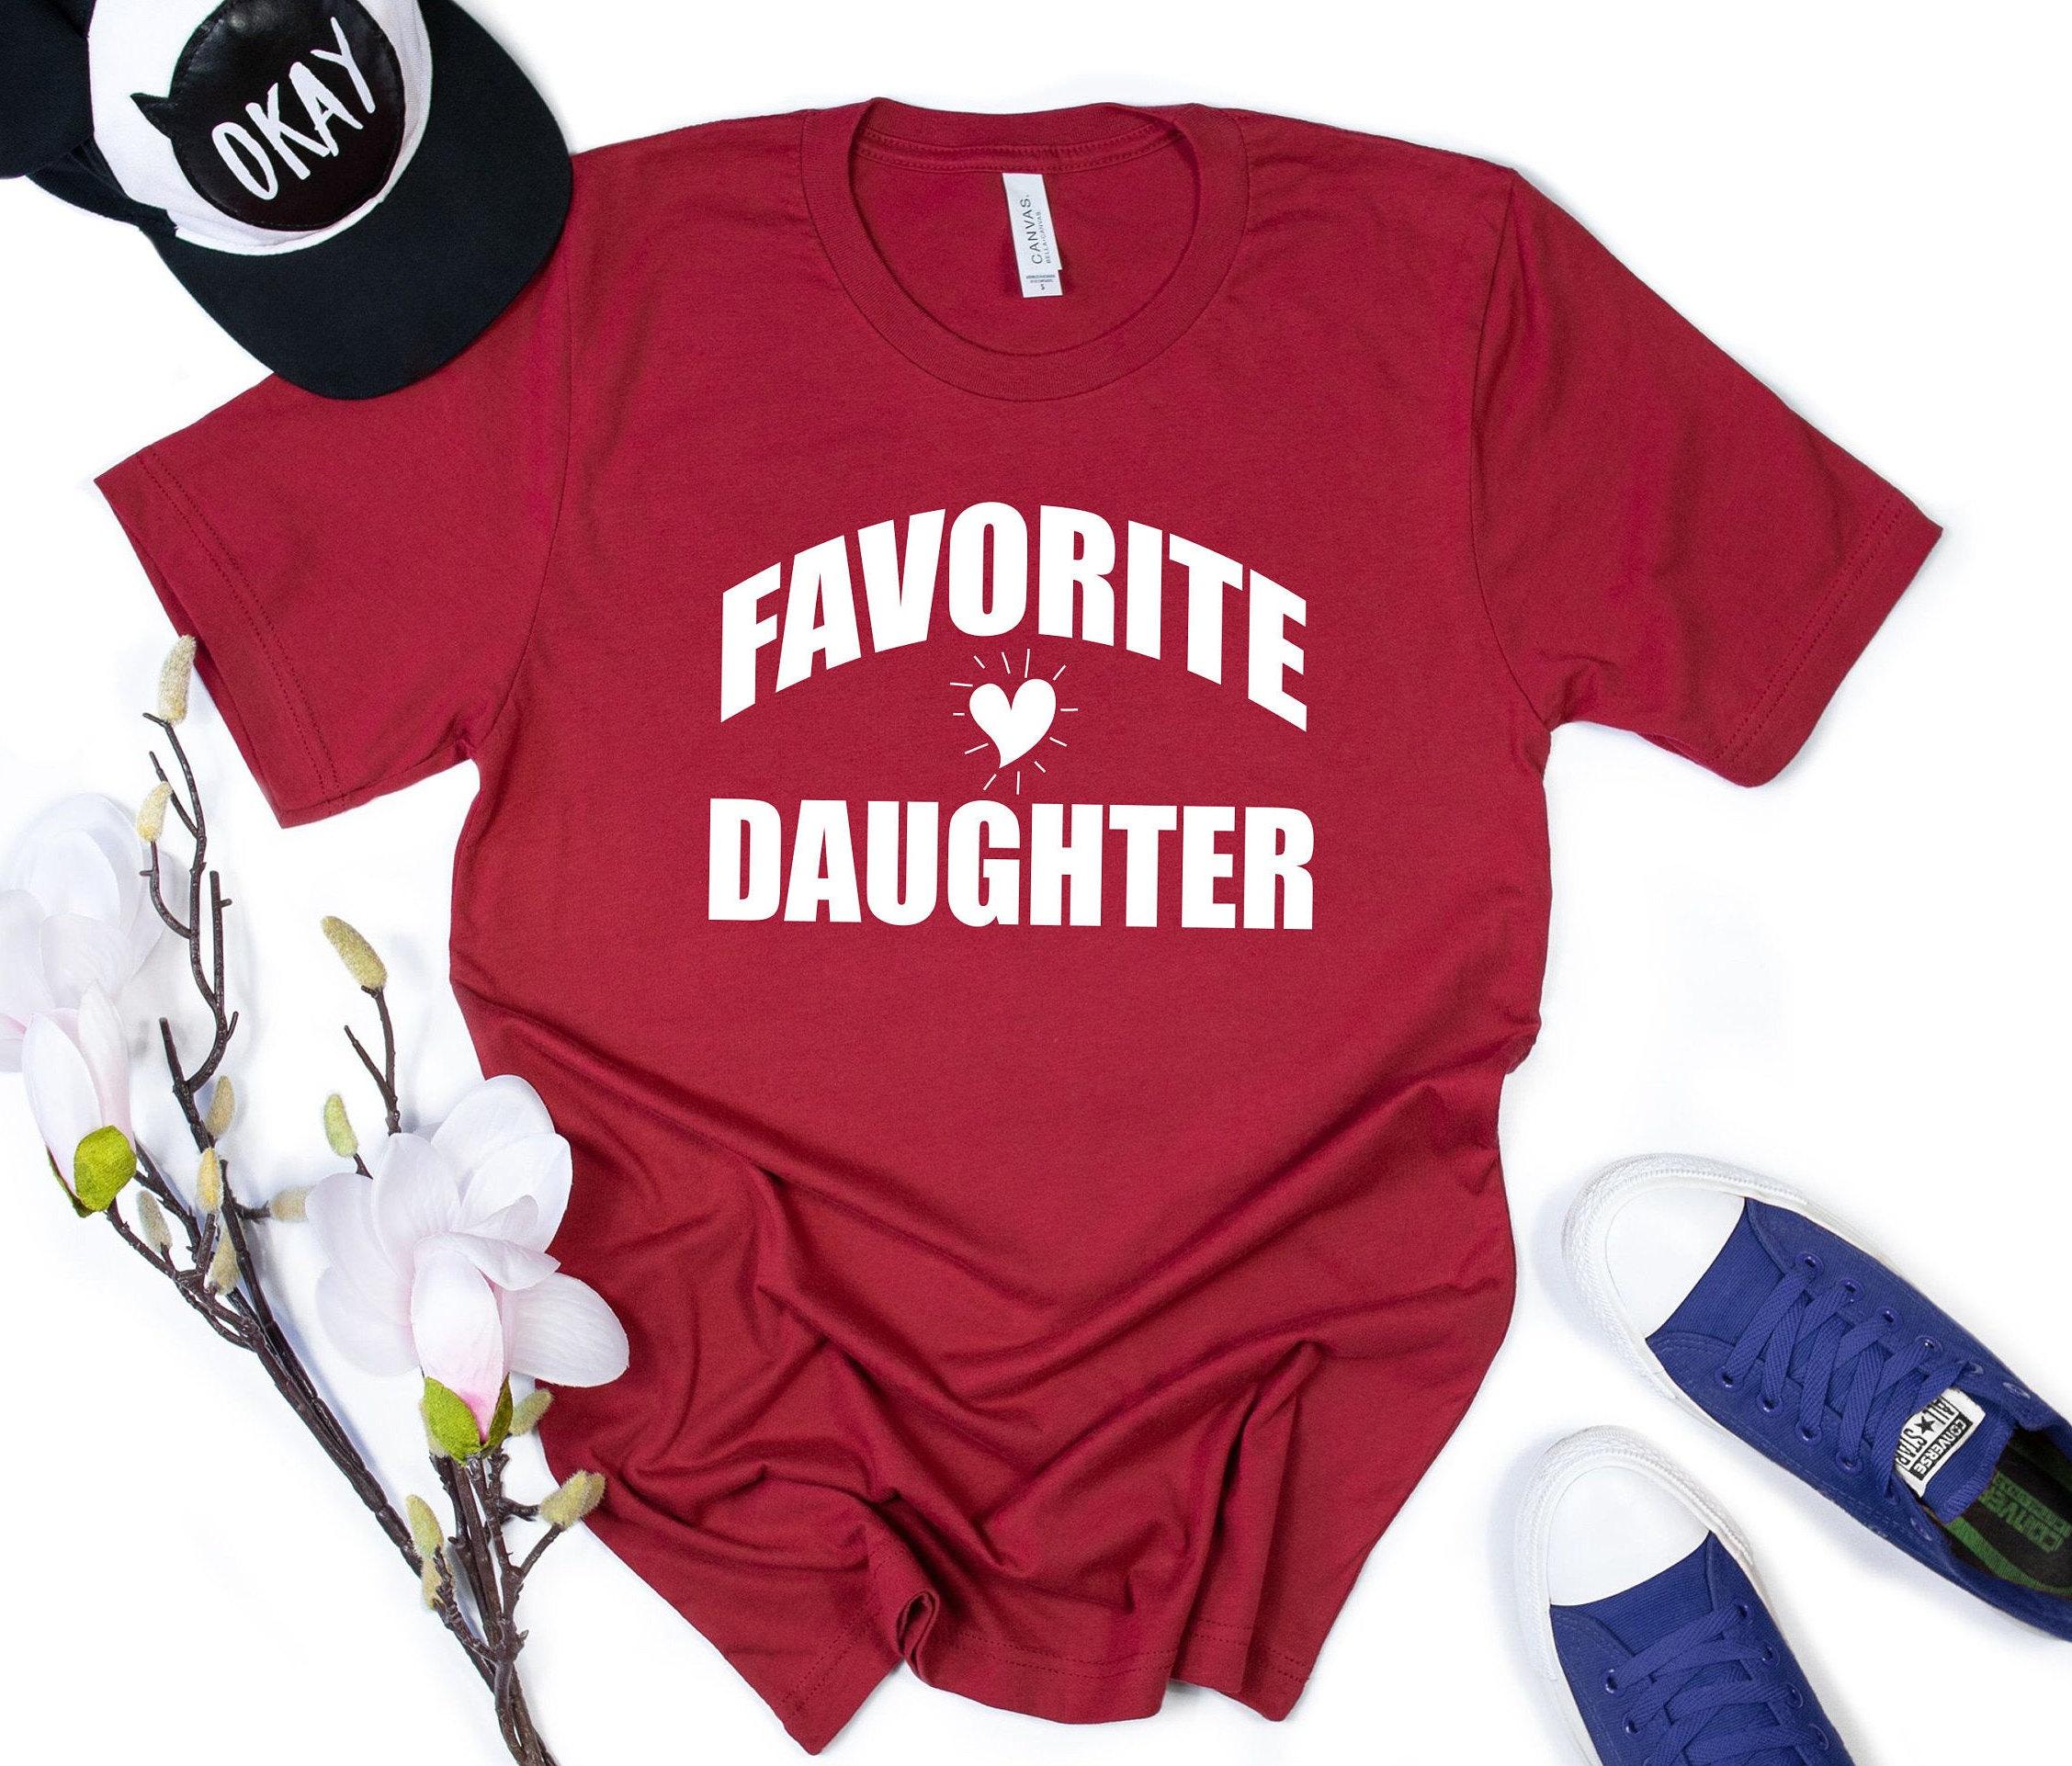 Mothers-day-svg-favorite-daughter-svg-daughter-svg-girls-svg-mom-svg-svg-mothers-day-design-svg-cuttable-svg-design-60512b7a